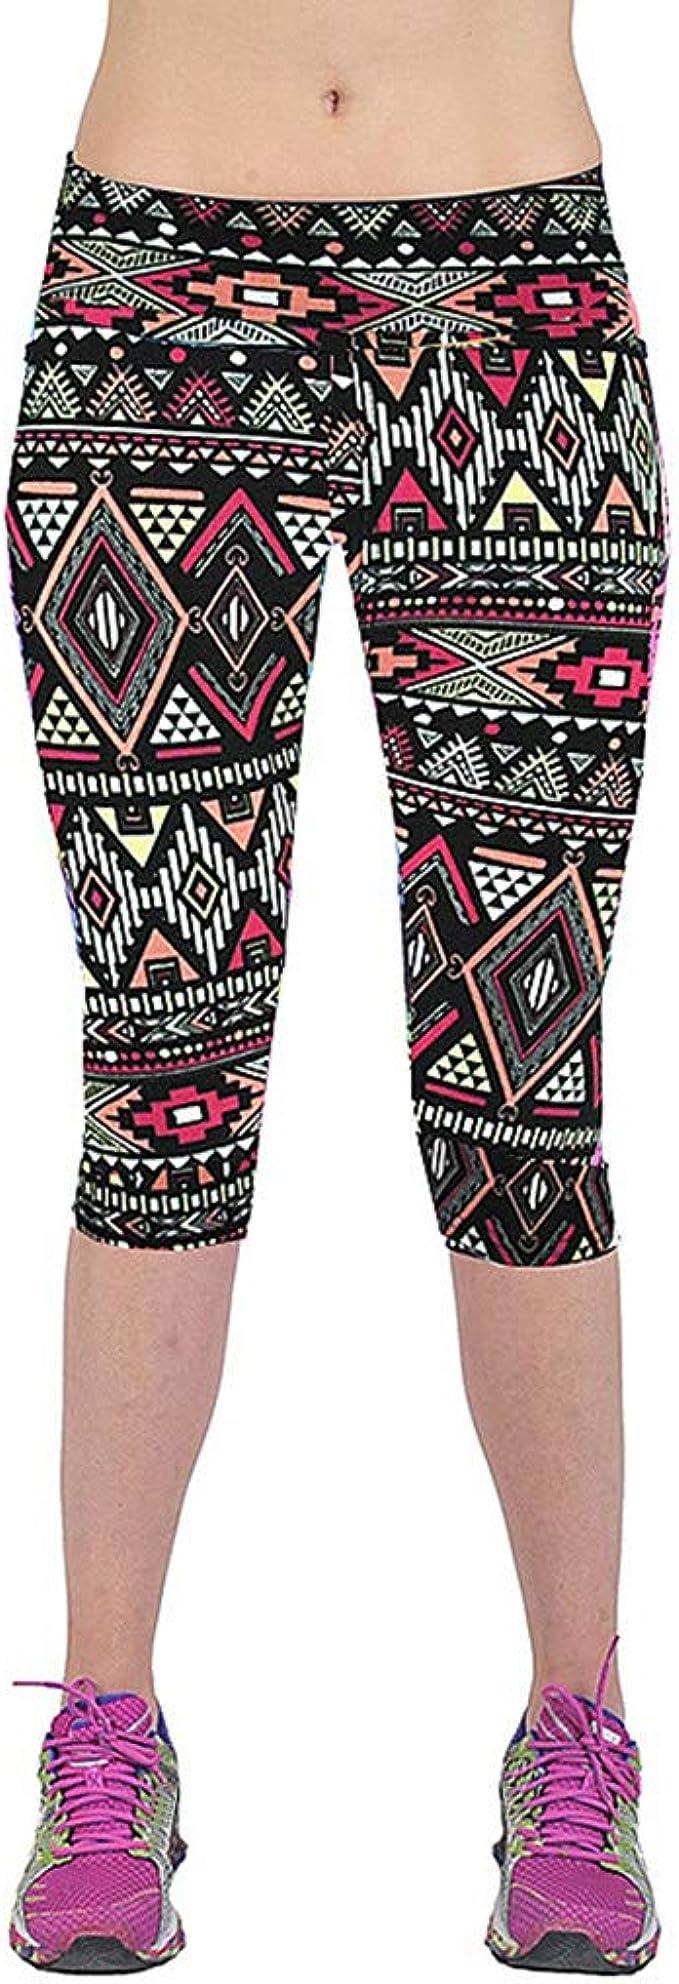 cinnamou Pantalones Bombachos Mujer Marrones Leggings Talle ...